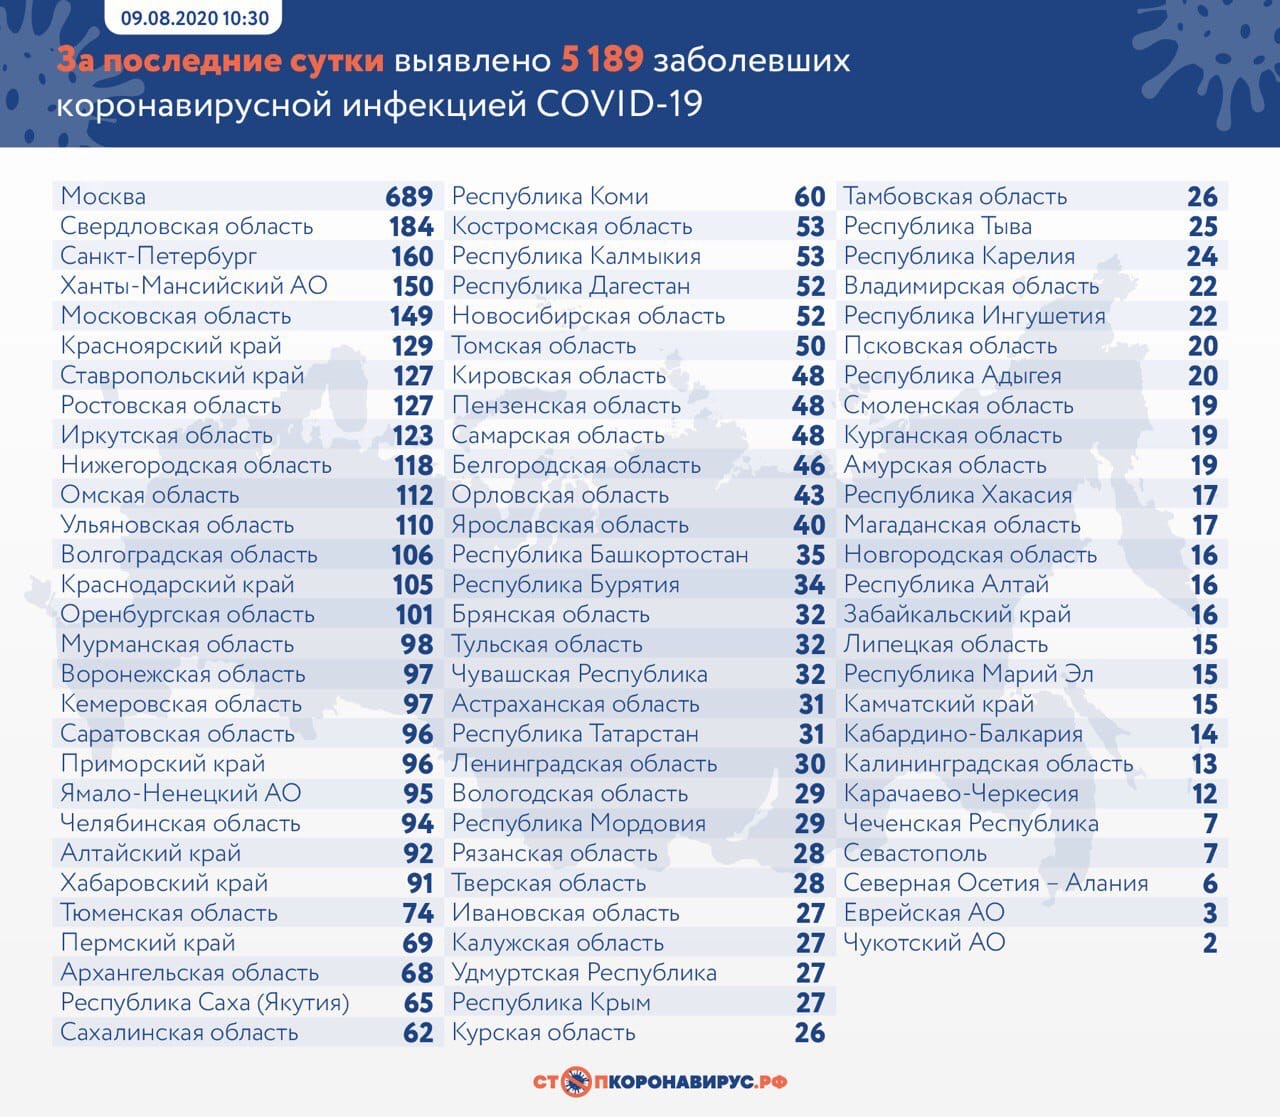 В Самарской области два человека умерли из-за коронавируса